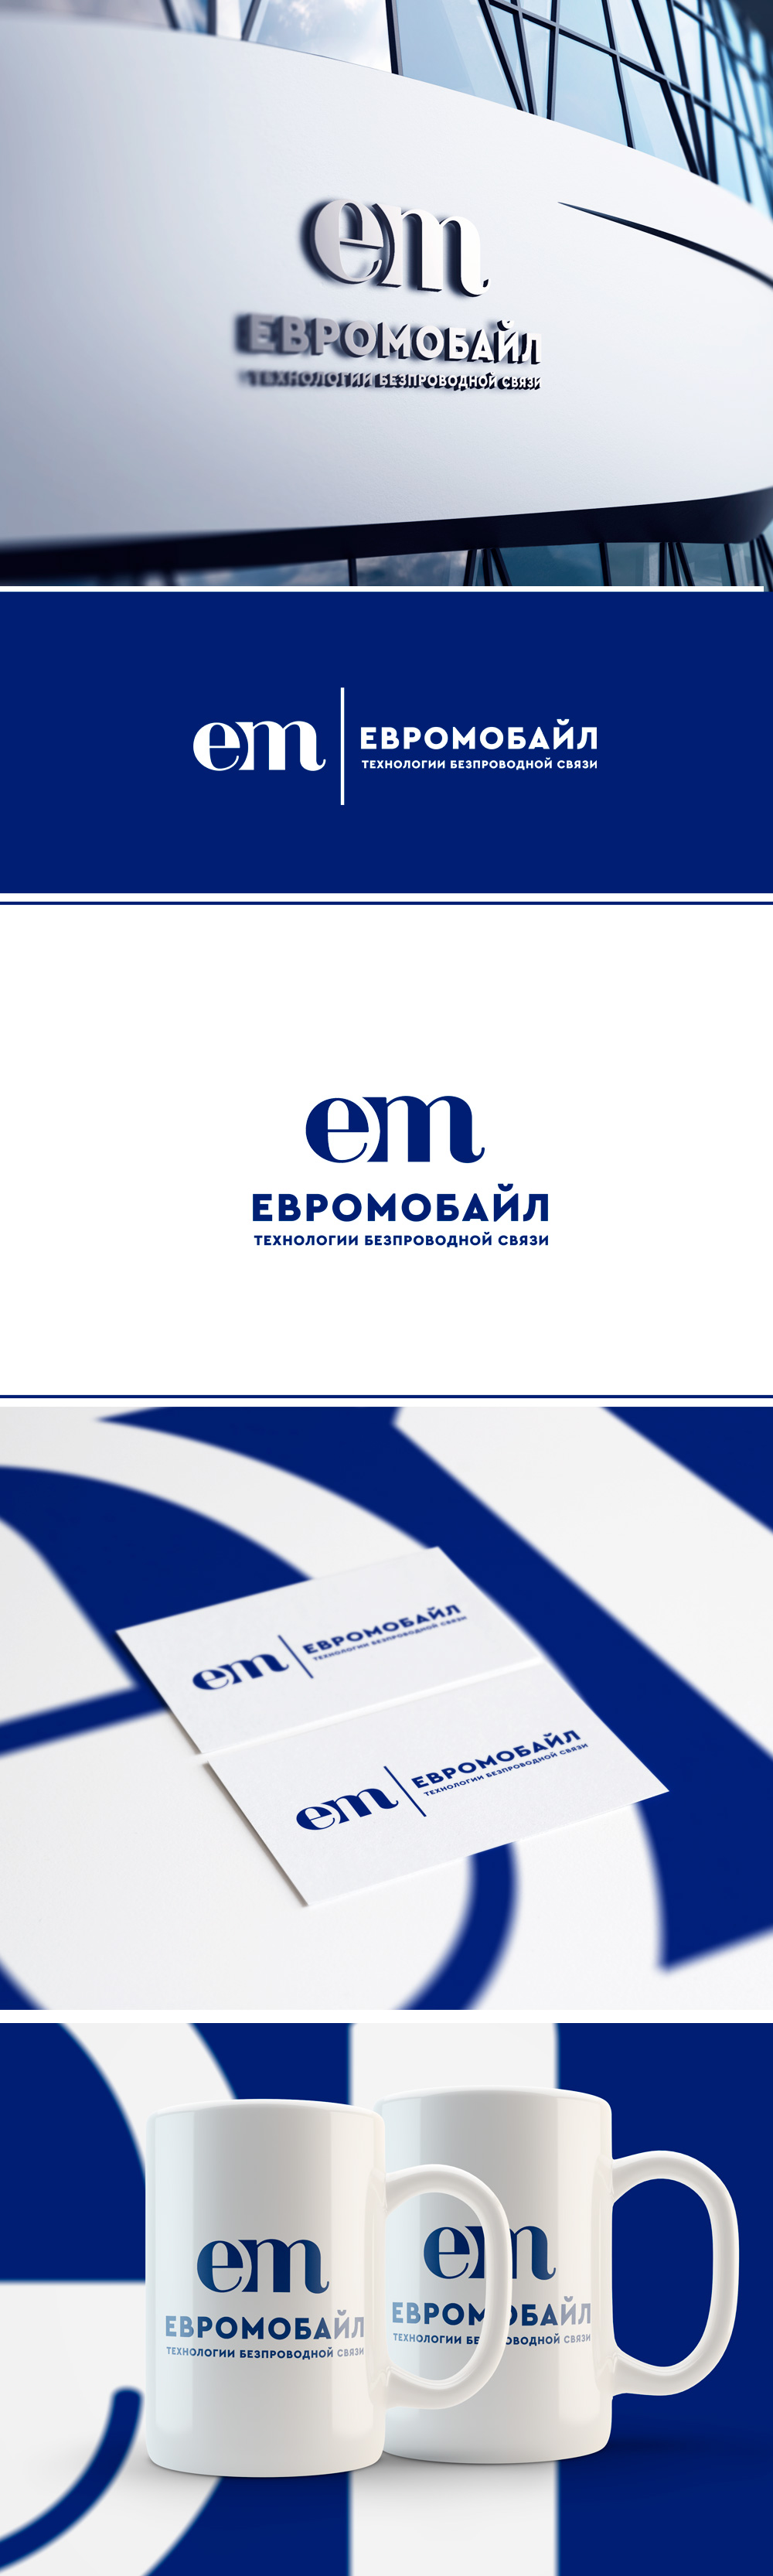 Редизайн логотипа фото f_18659bfafcb8cd05.jpg